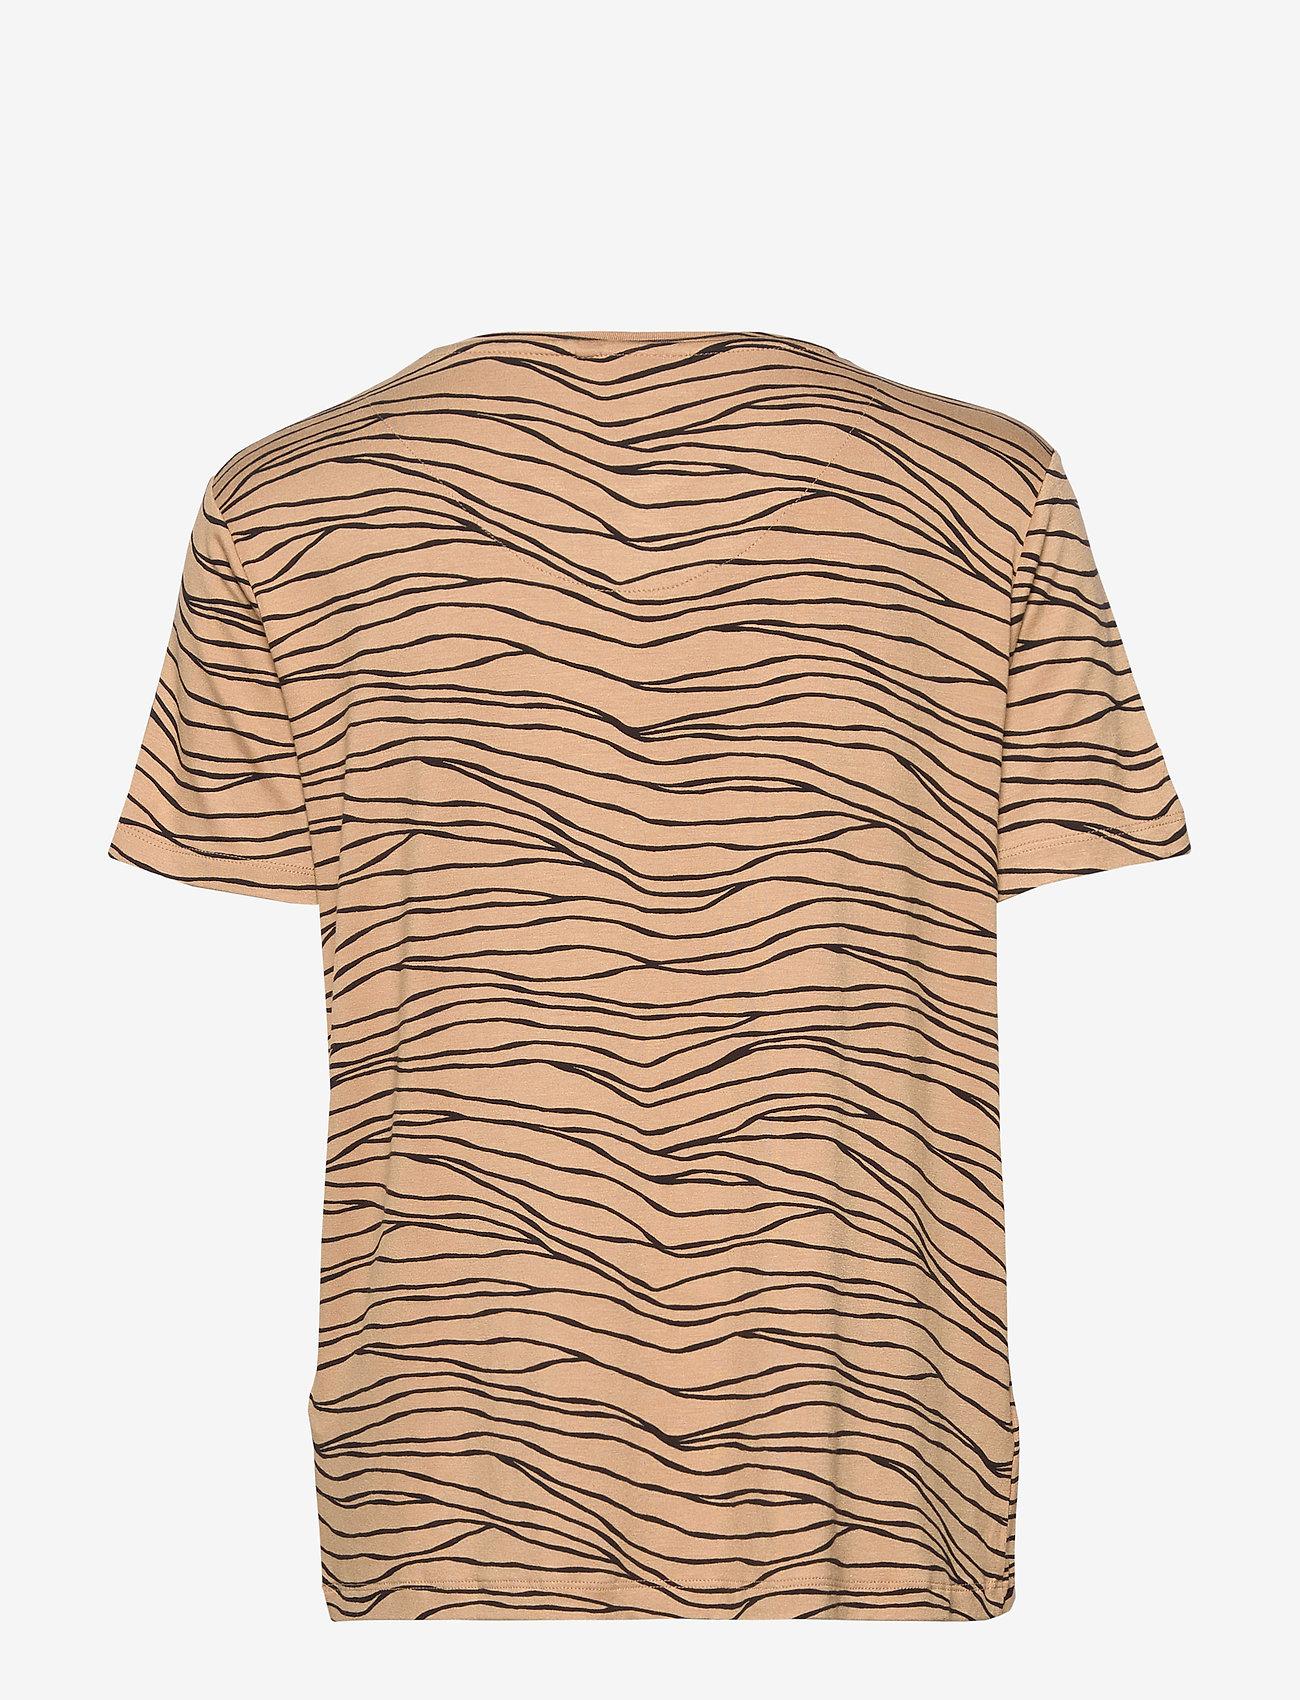 Byrillo Tshirt 3 - (Almond Combi 1) - b.young iWT2aO